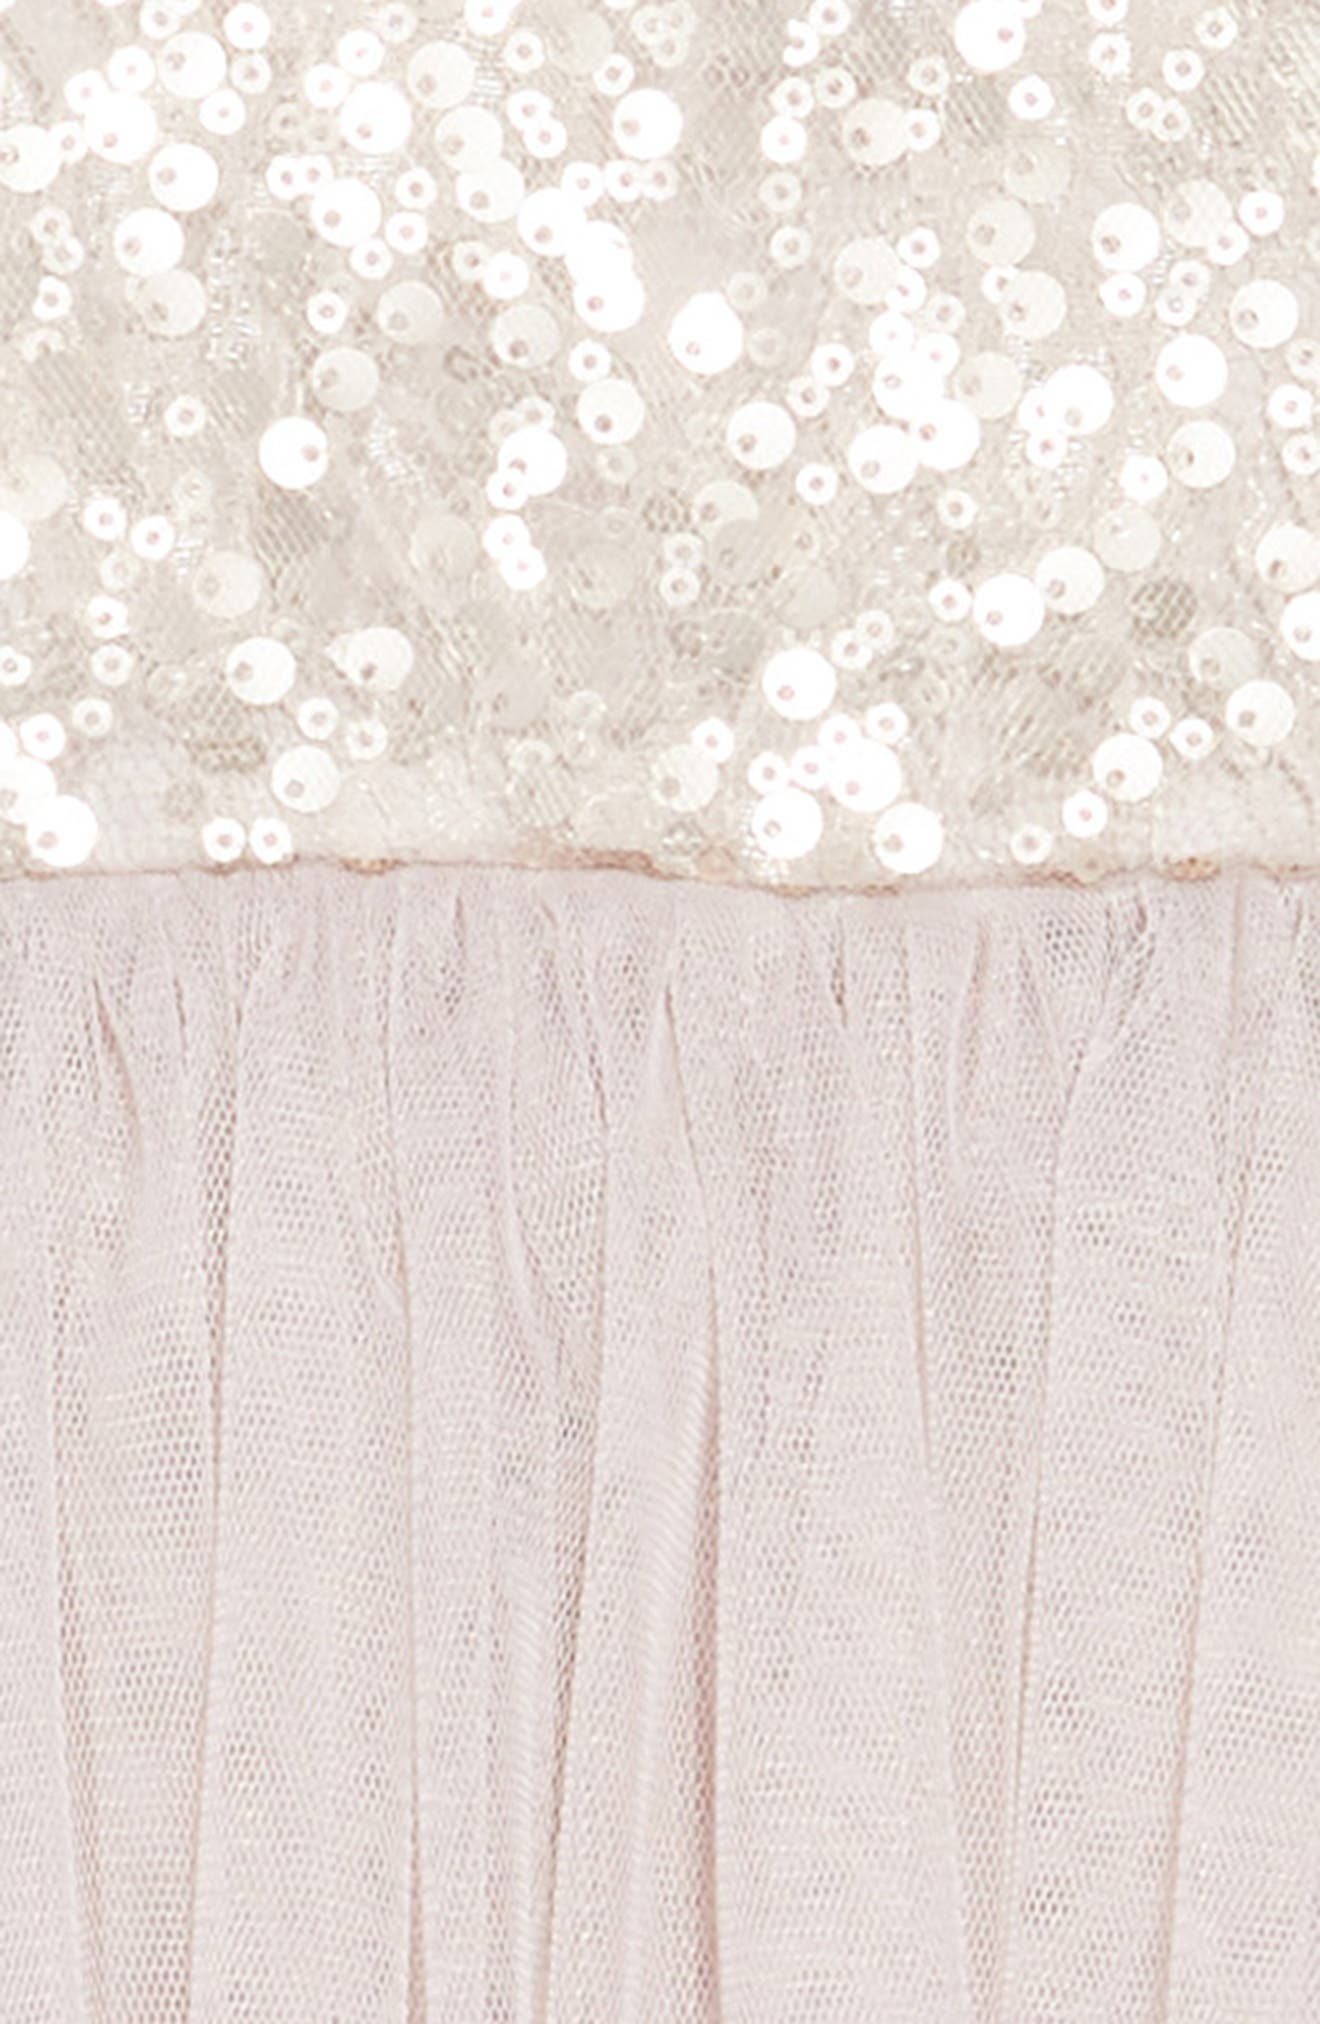 Sequin & Tulle Dress,                             Alternate thumbnail 3, color,                             650